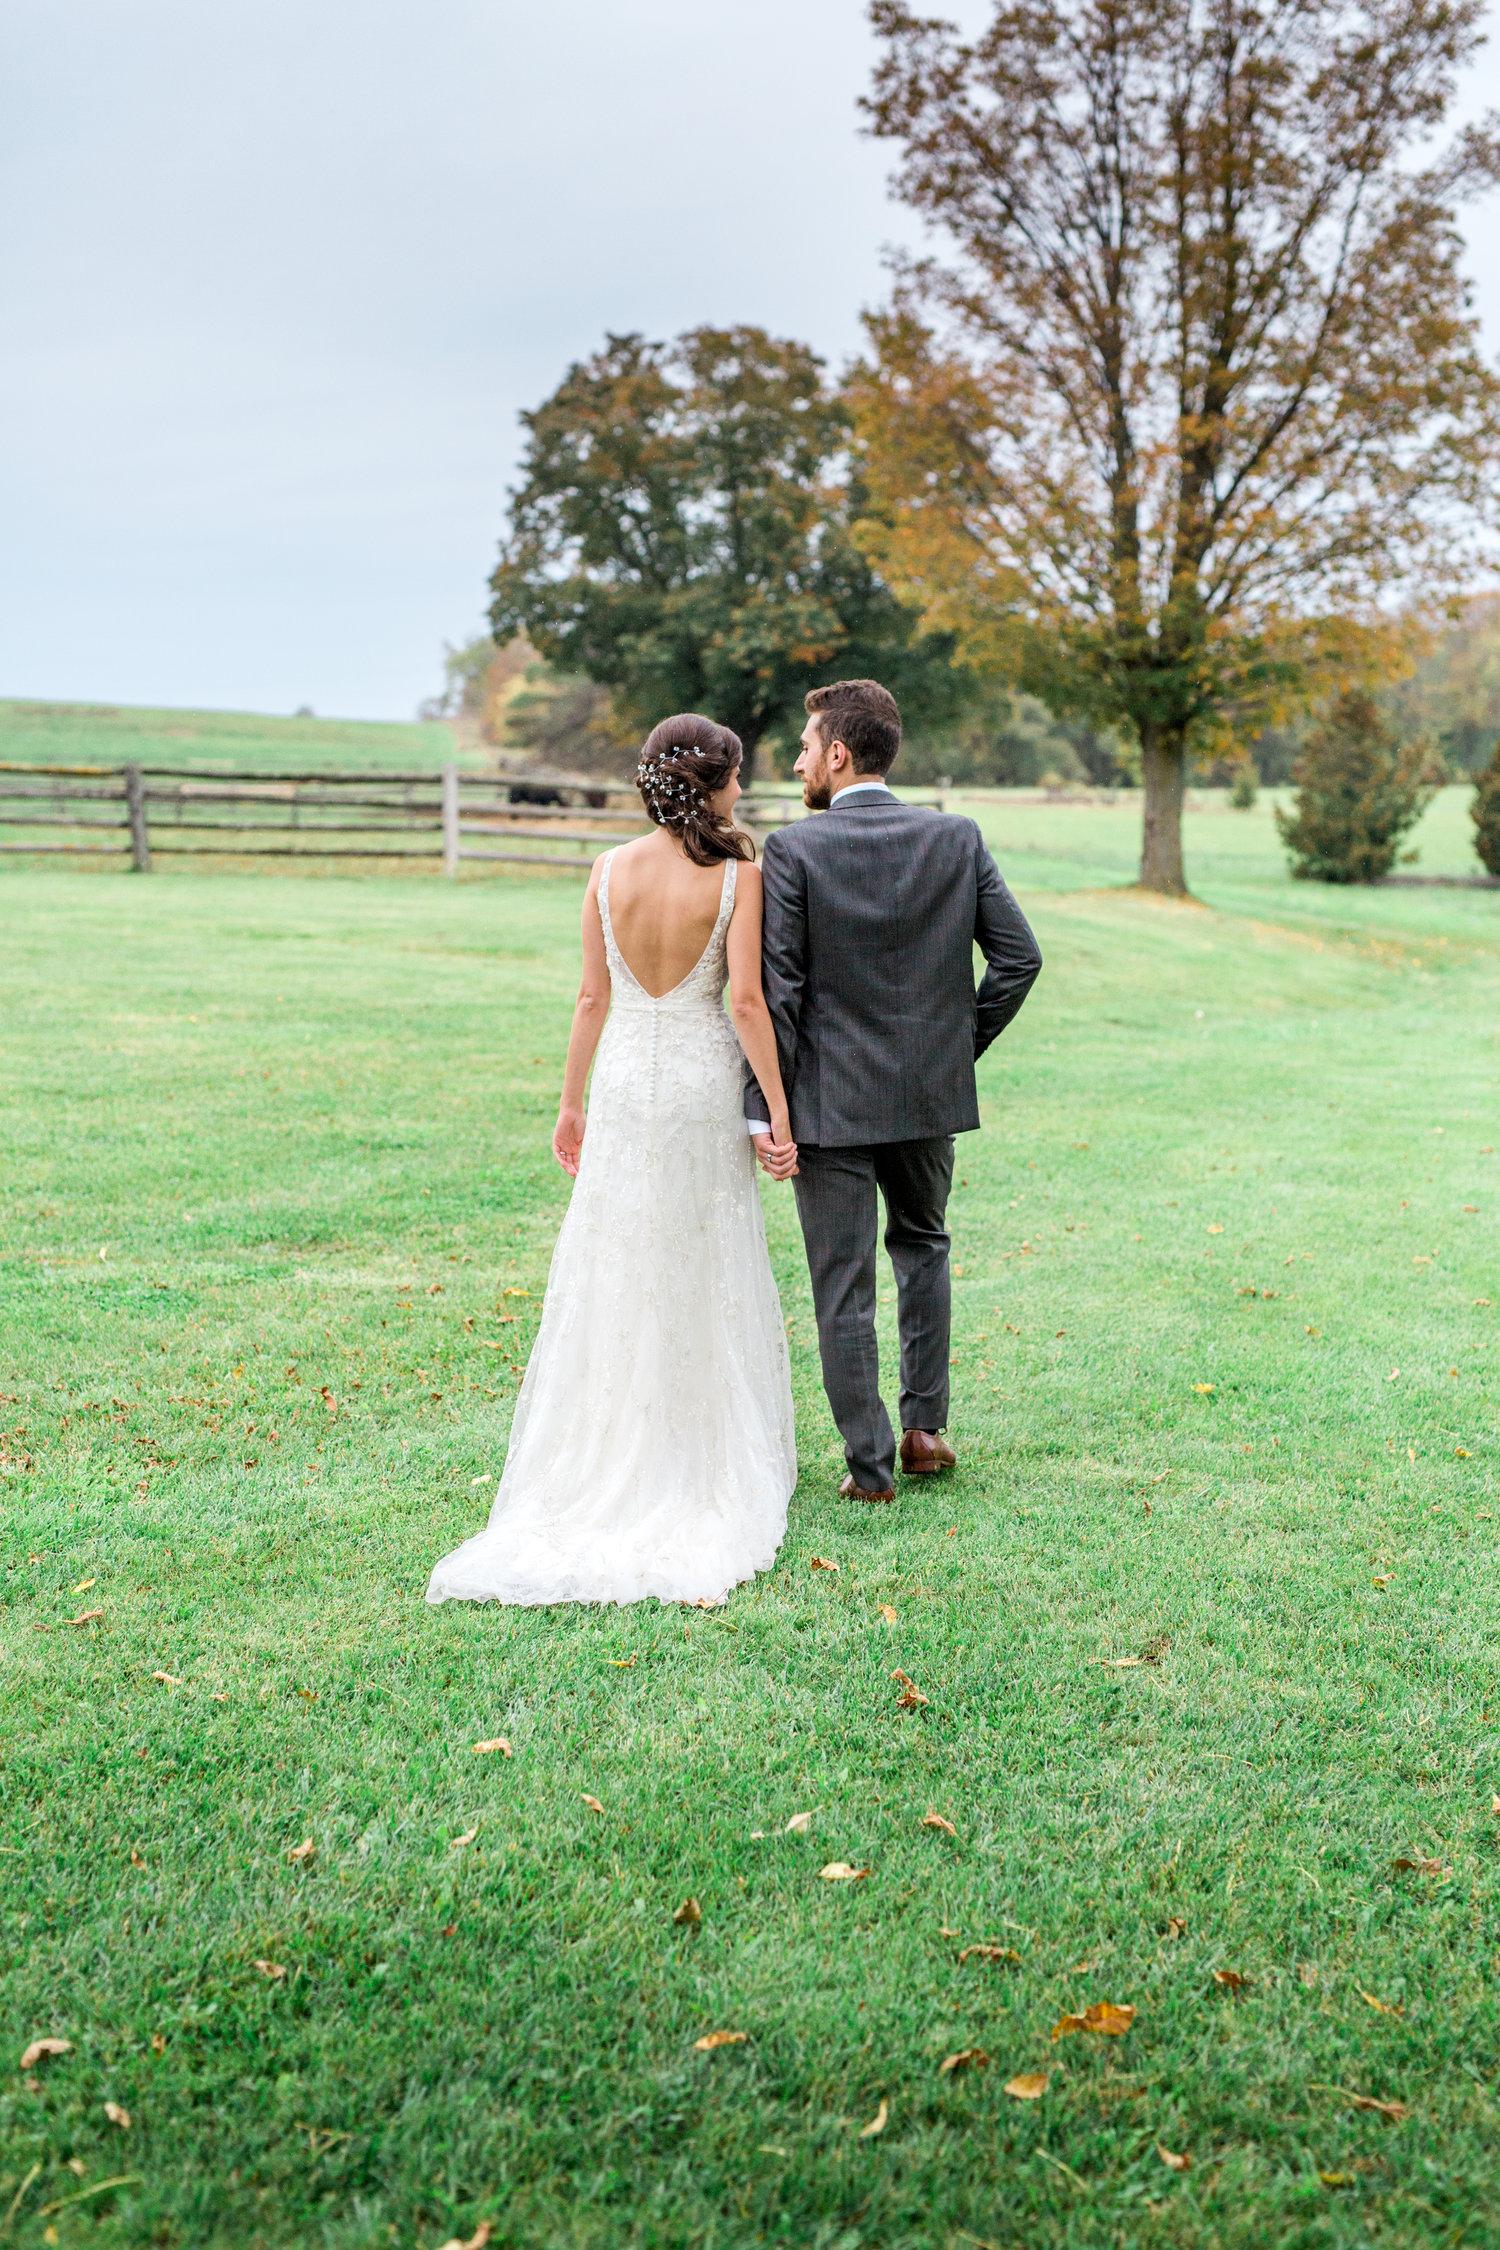 Amir-Golbazi-Danielle-Giroux-Photography_Toronto-Wedding_Cedarwood_Rachel-Paul_465.jpg